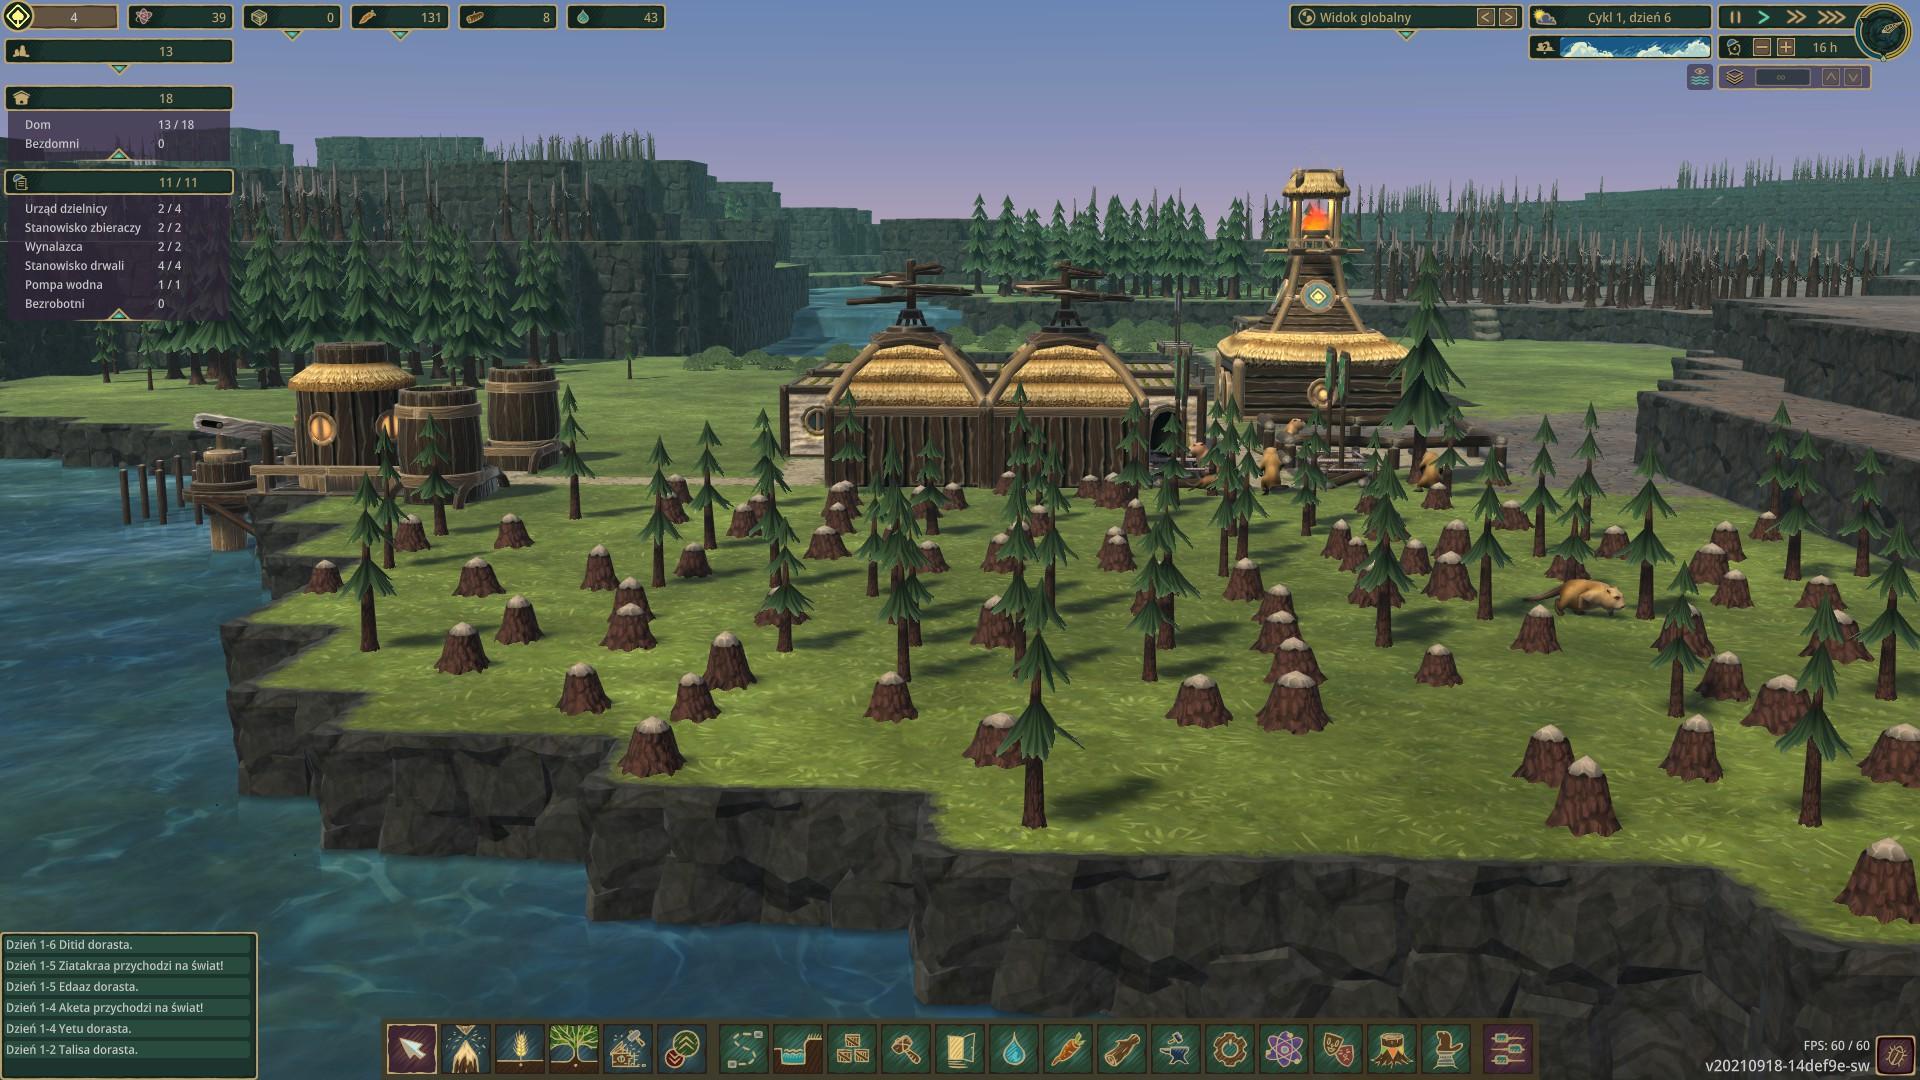 Timberborn screenshot 2